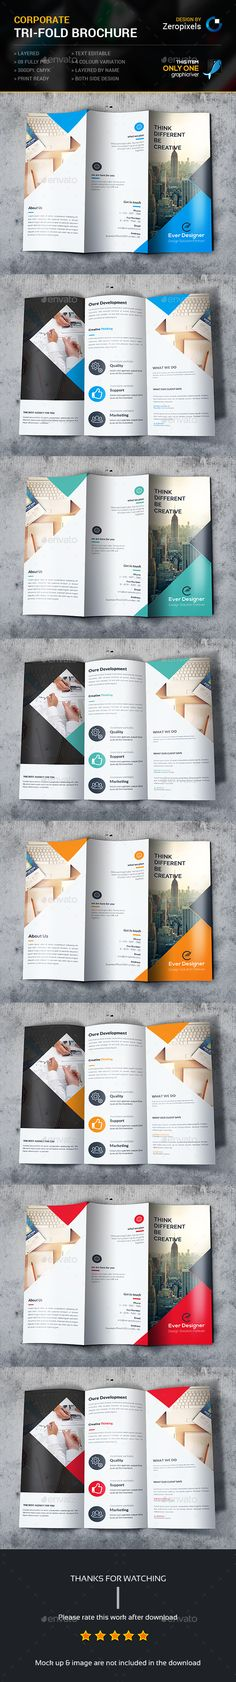 Tri-fold Brochure Template PSD. Download here: http://graphicriver.net/item/trifold-brochure/15277101?ref=ksioks